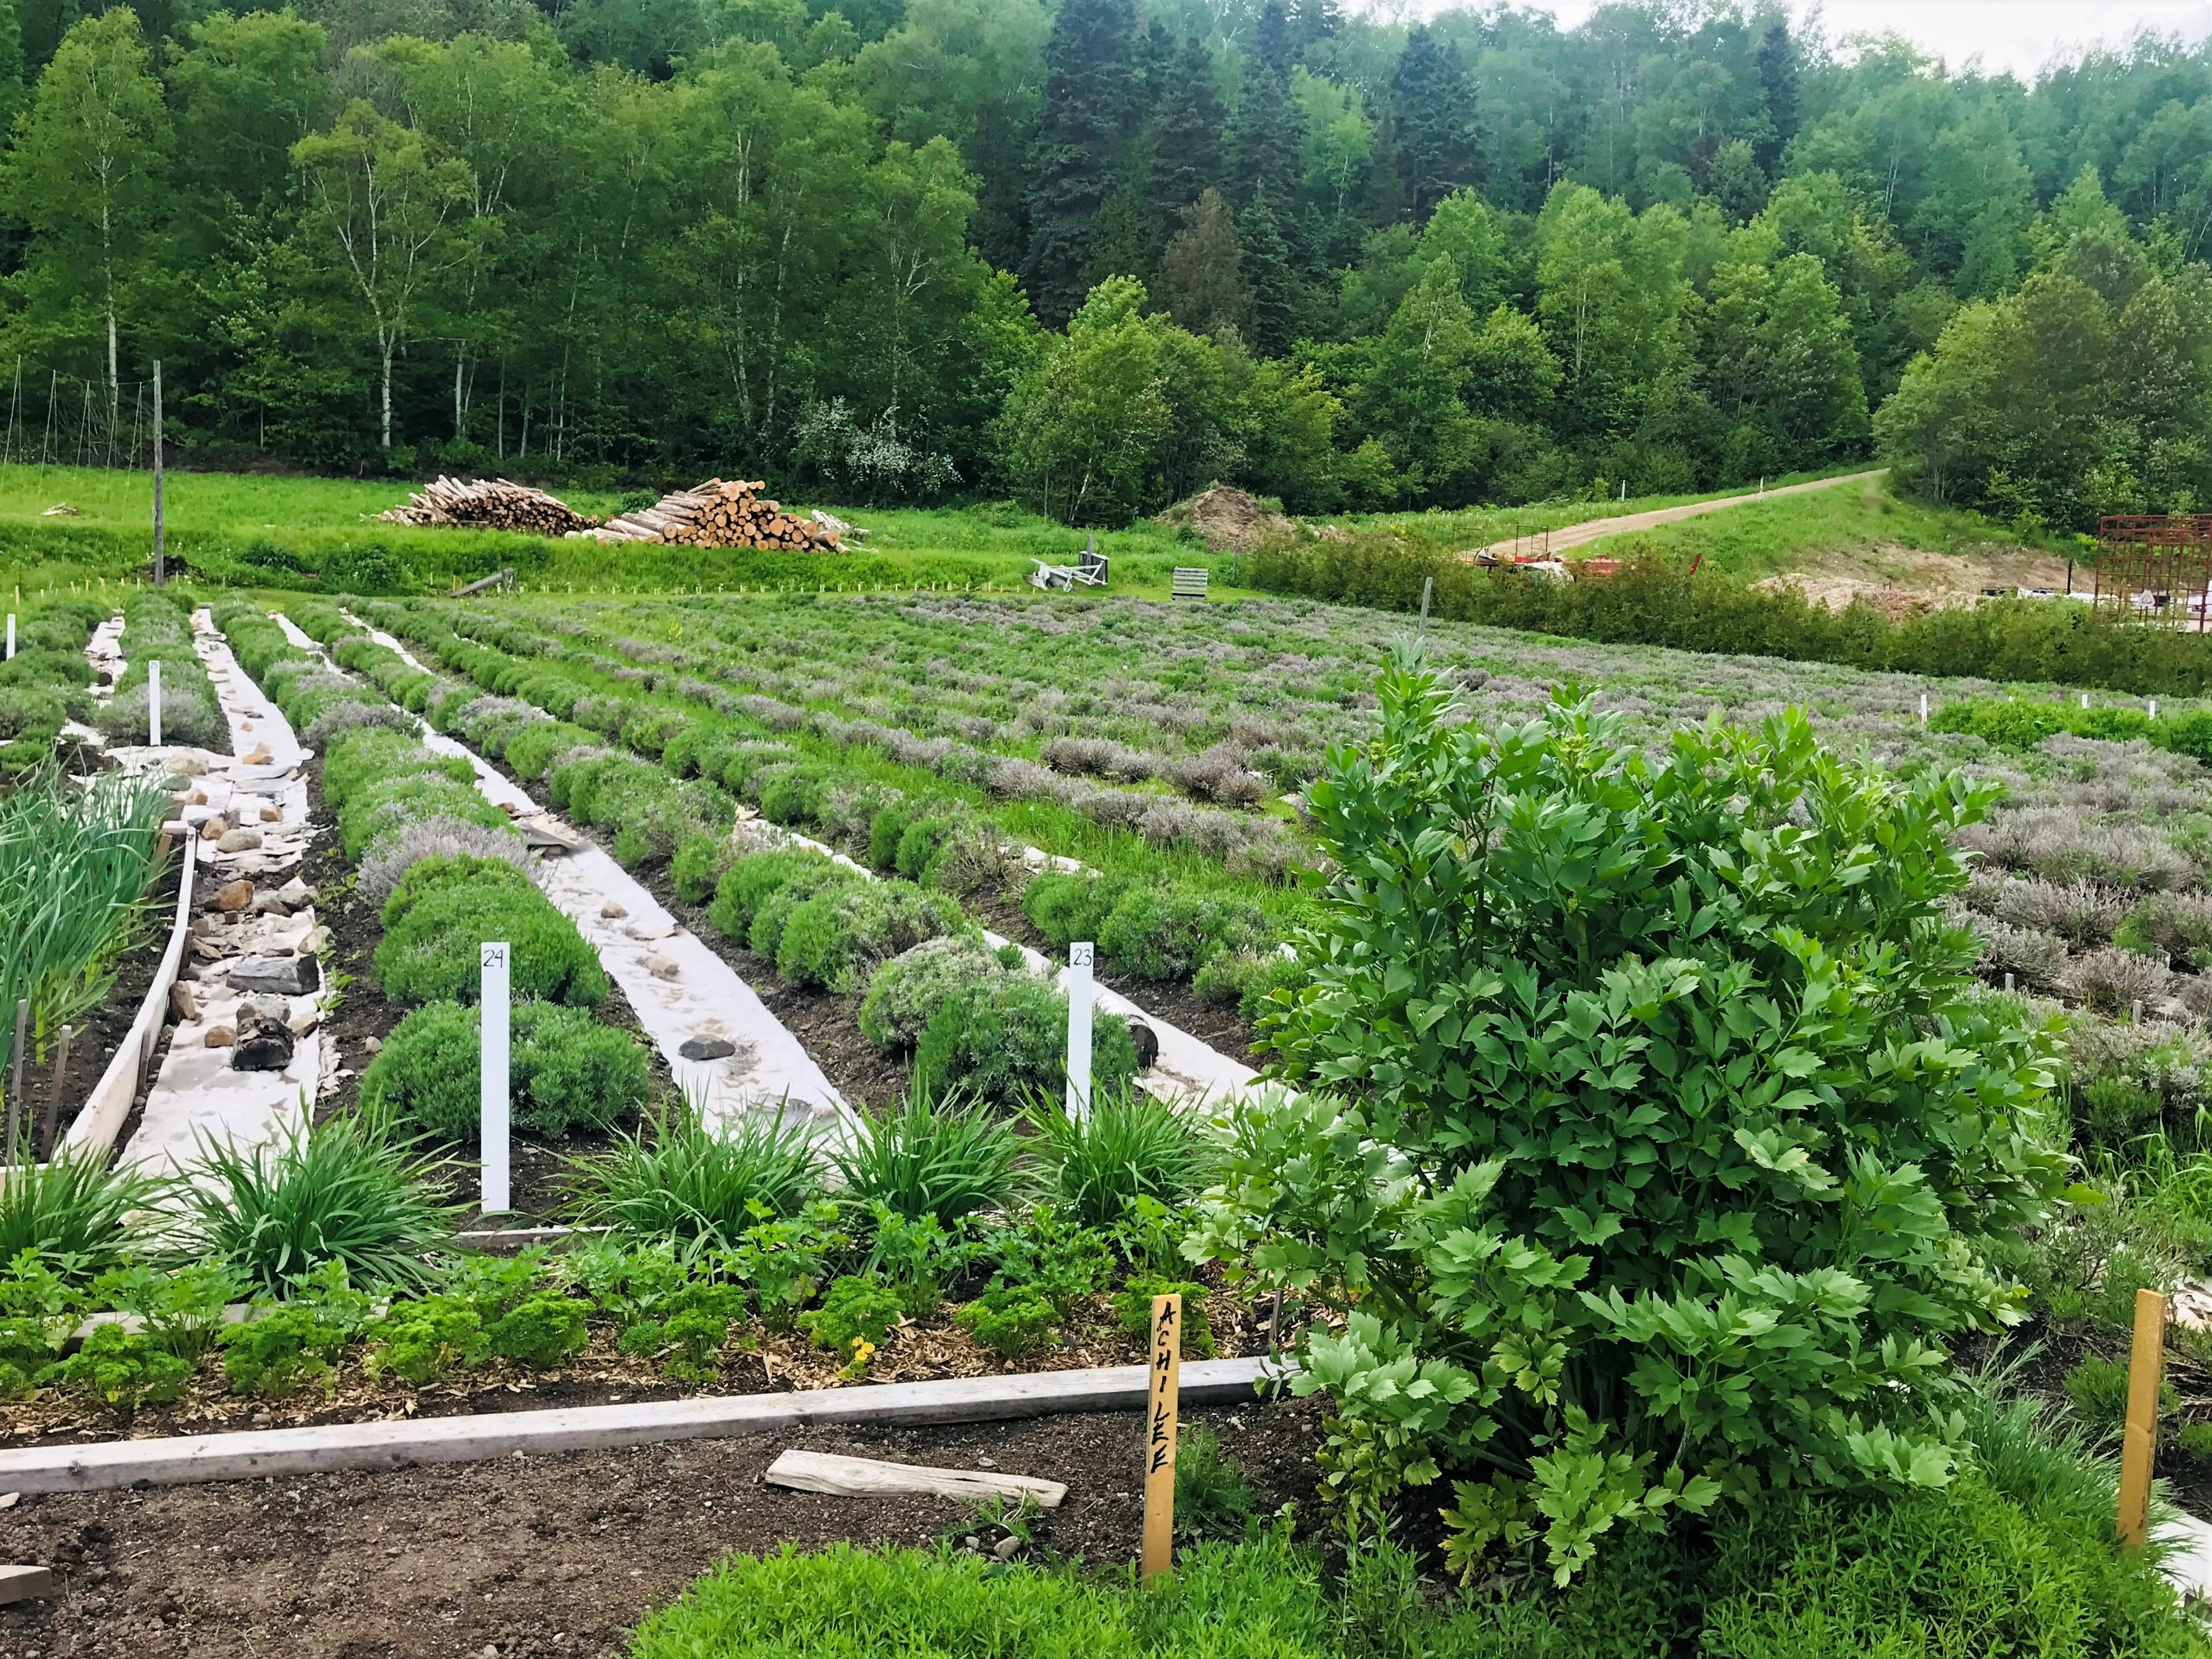 Cultivo de lavanda en Azulée  en la ruta del sabor de Charlevoix, Quebec.